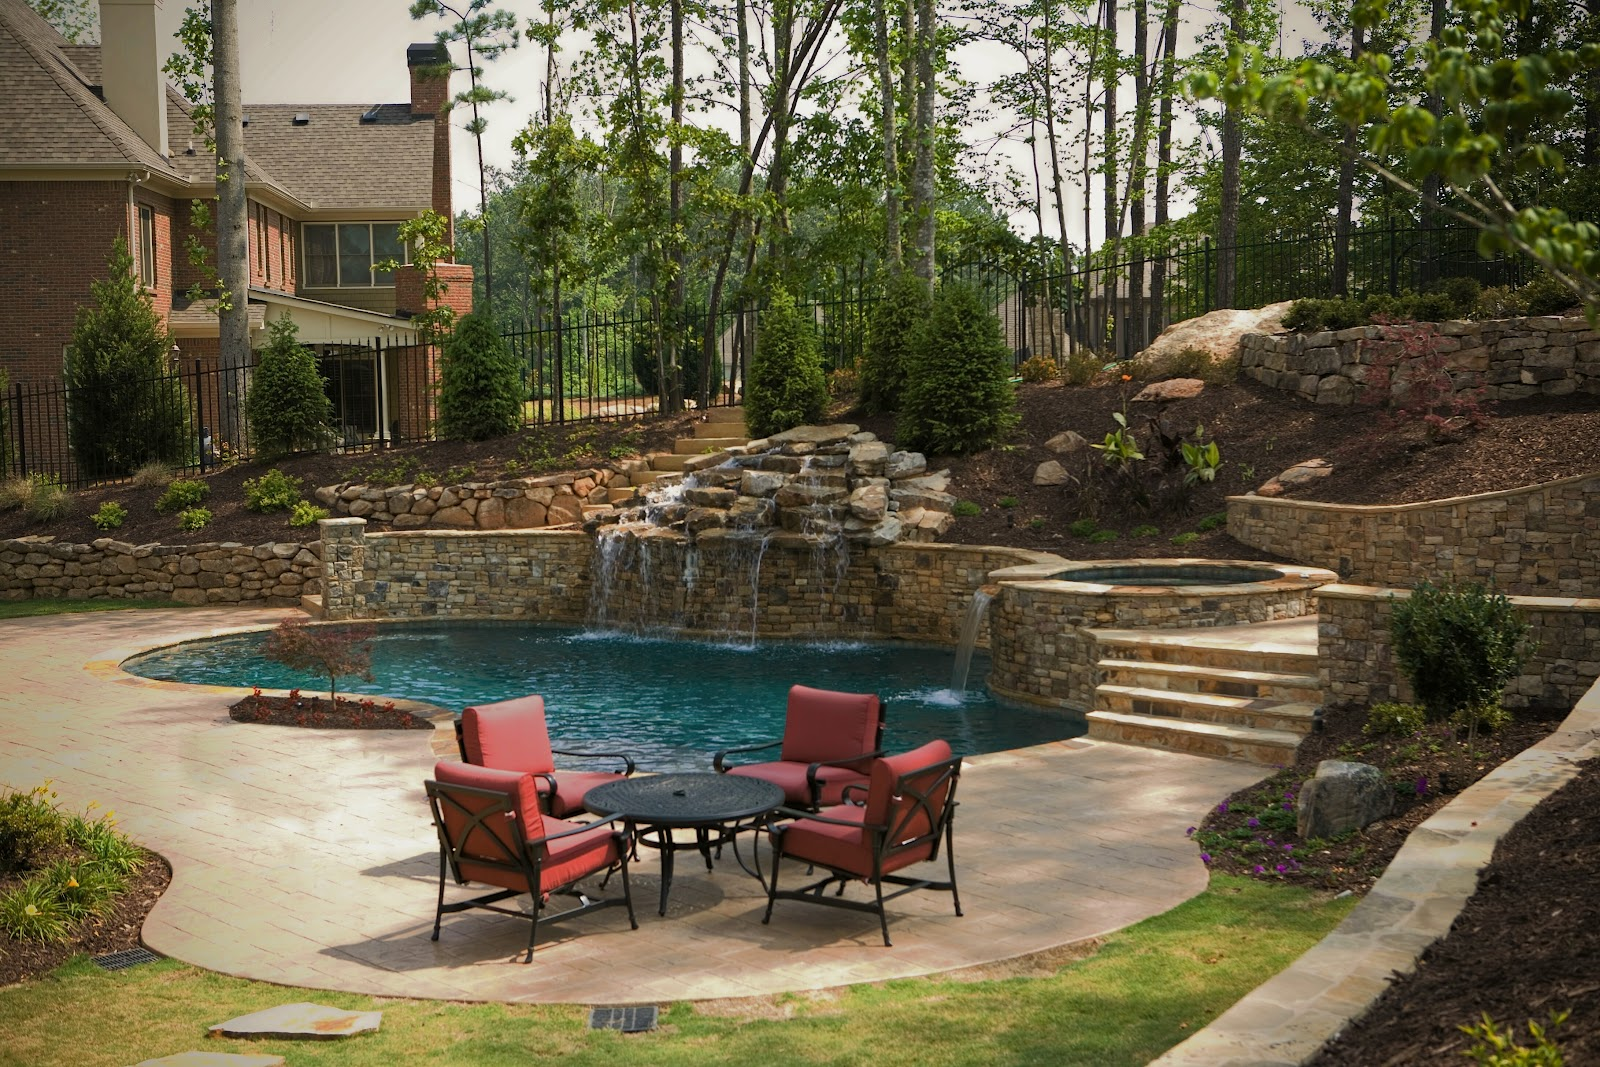 Backyard Oasis Pools Free Form Pool Creekstone